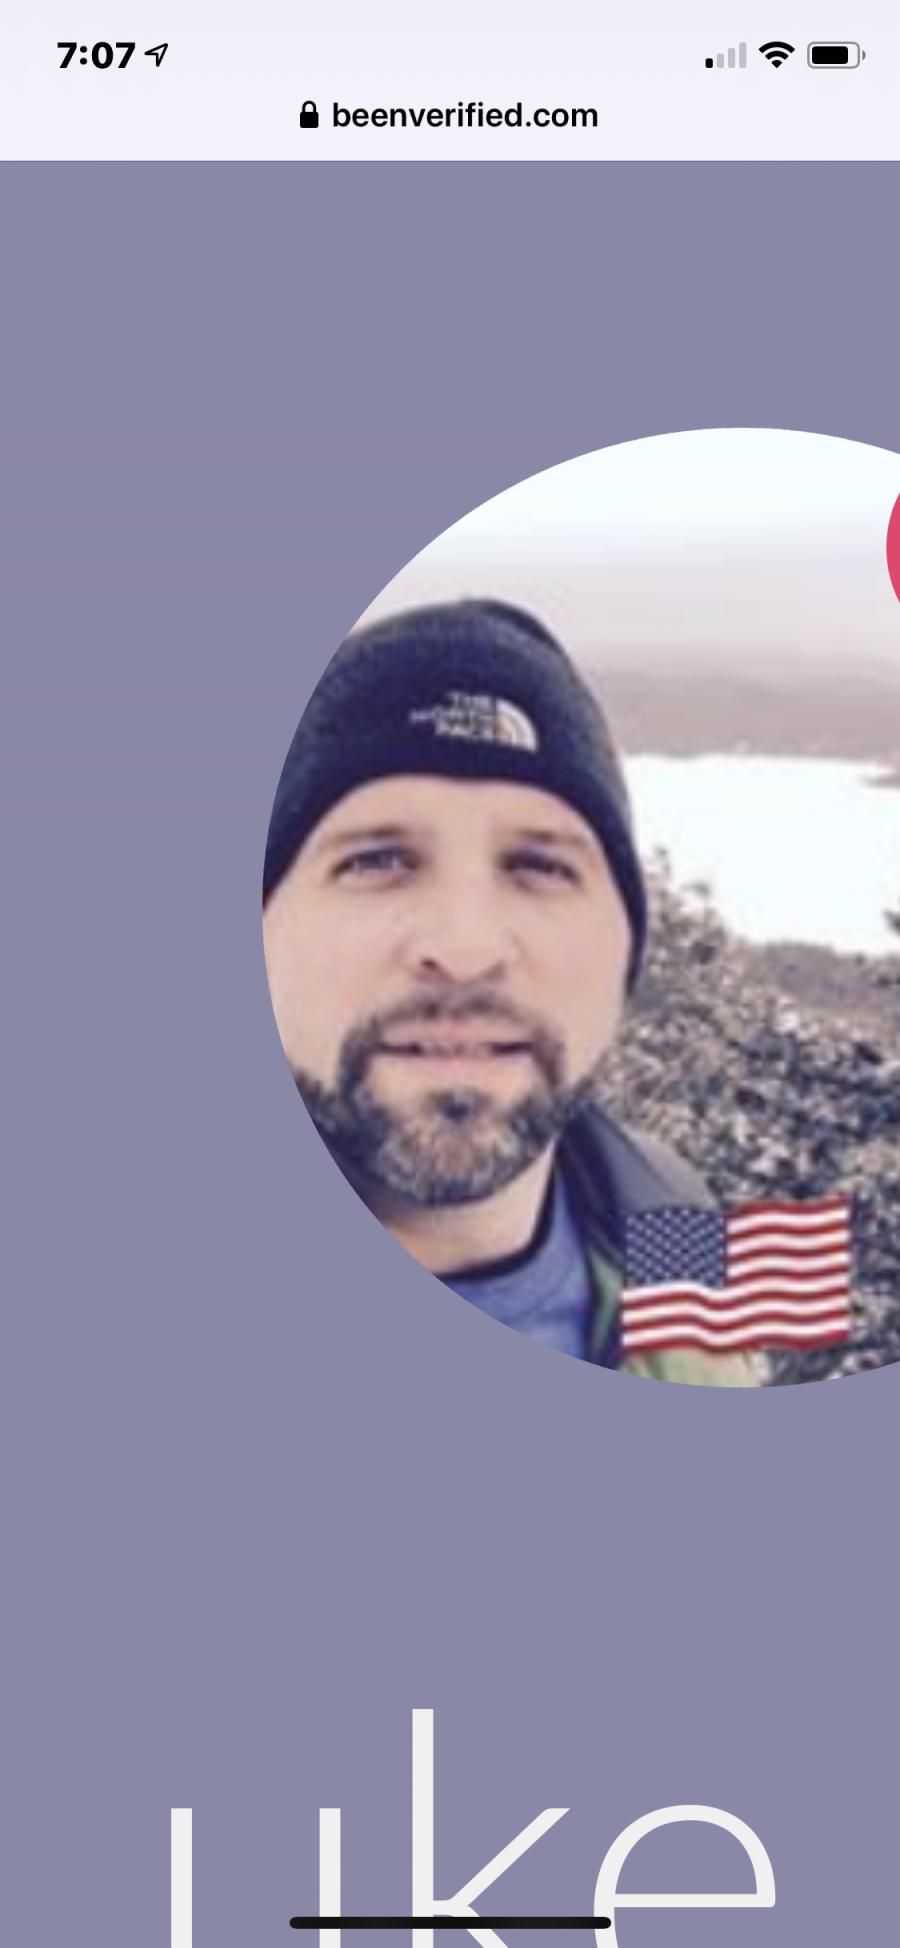 Jeff Luke S Home Improvement 2020 Reports Reviews Scampulse Com